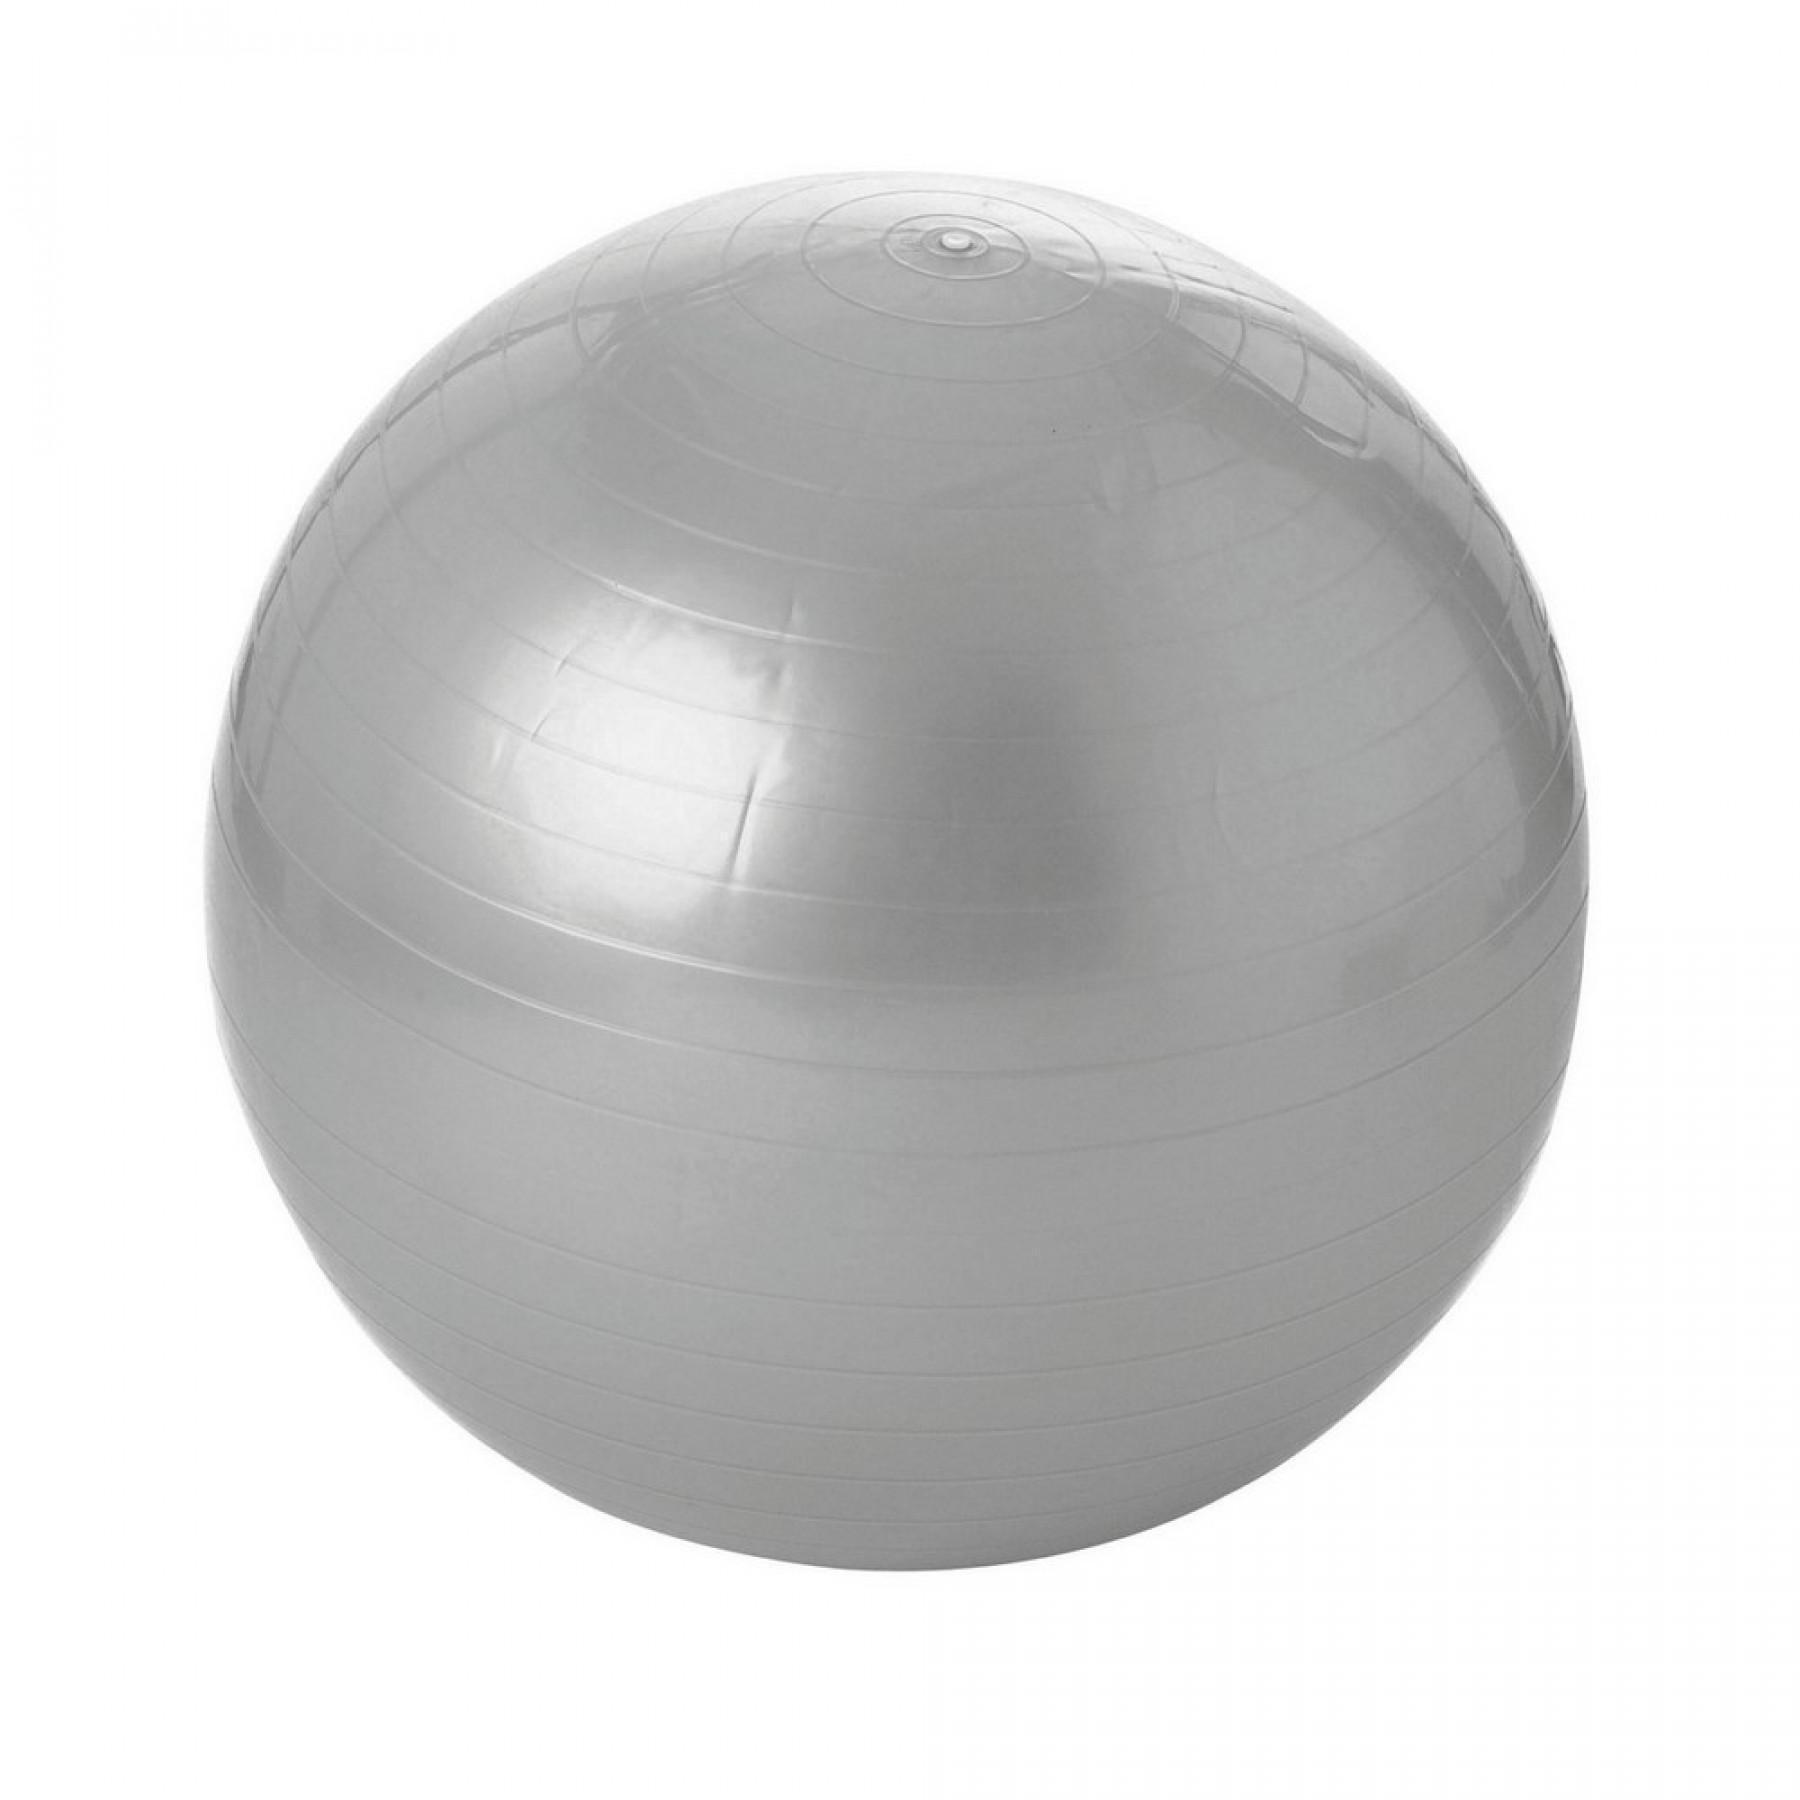 gymnastic ball - 75 cm